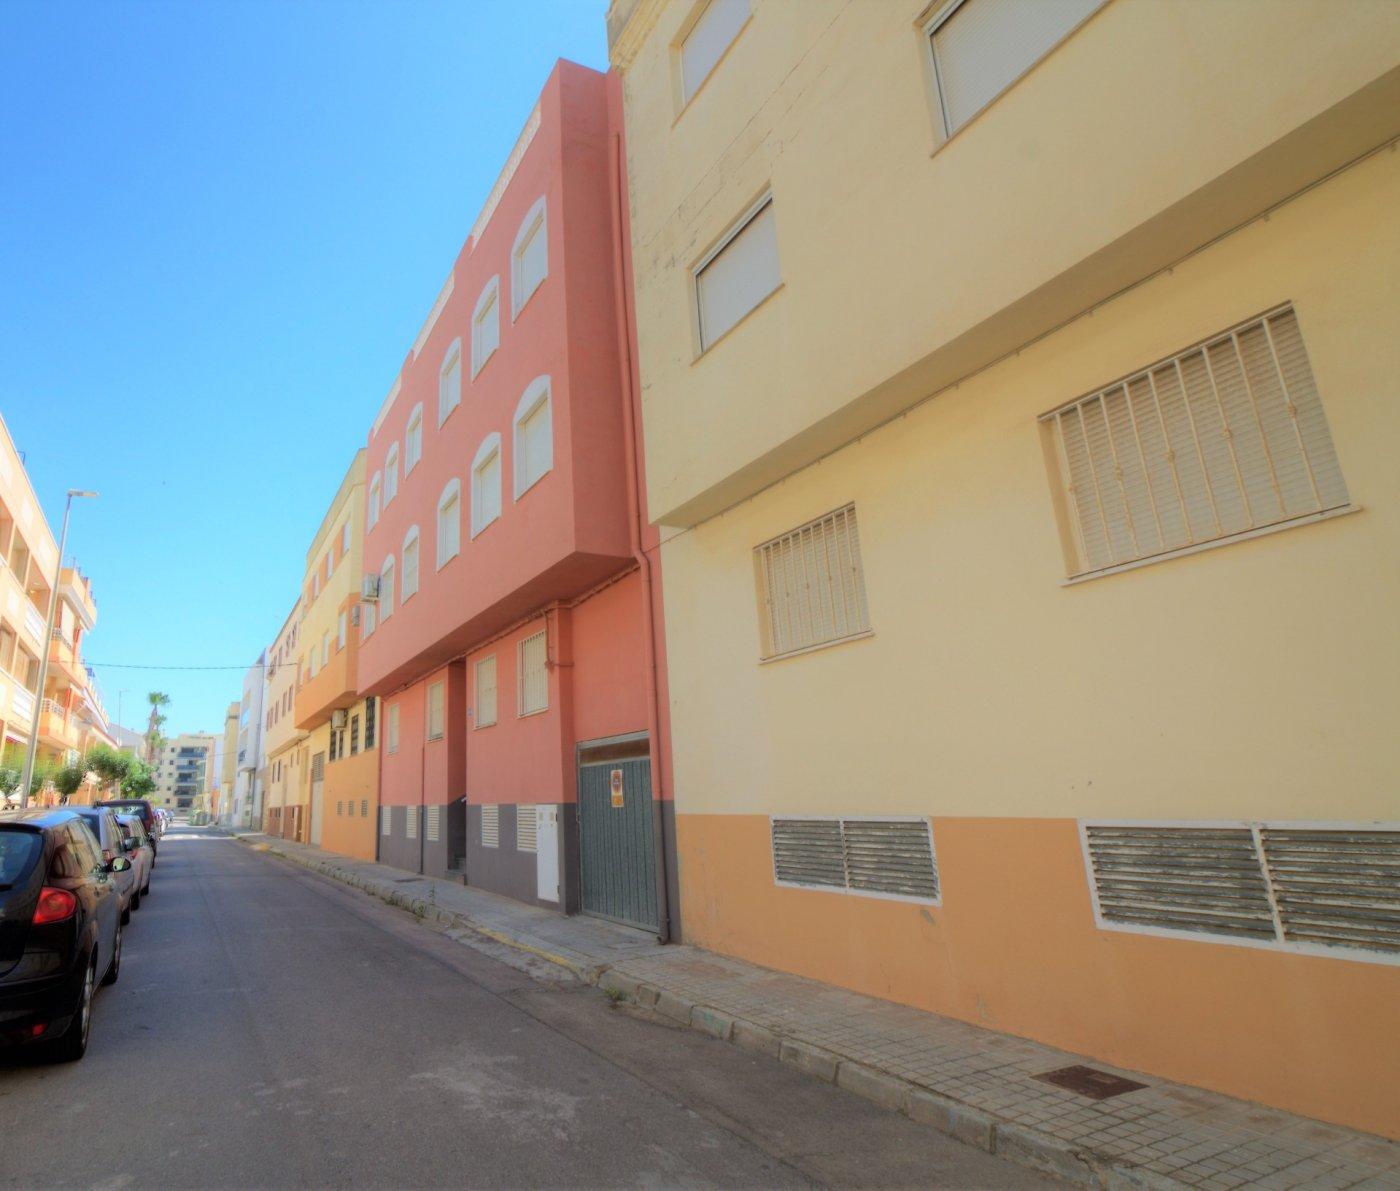 Ático Dúplex · Chilches - Xilxes · Playa Les Cases 110.000€€